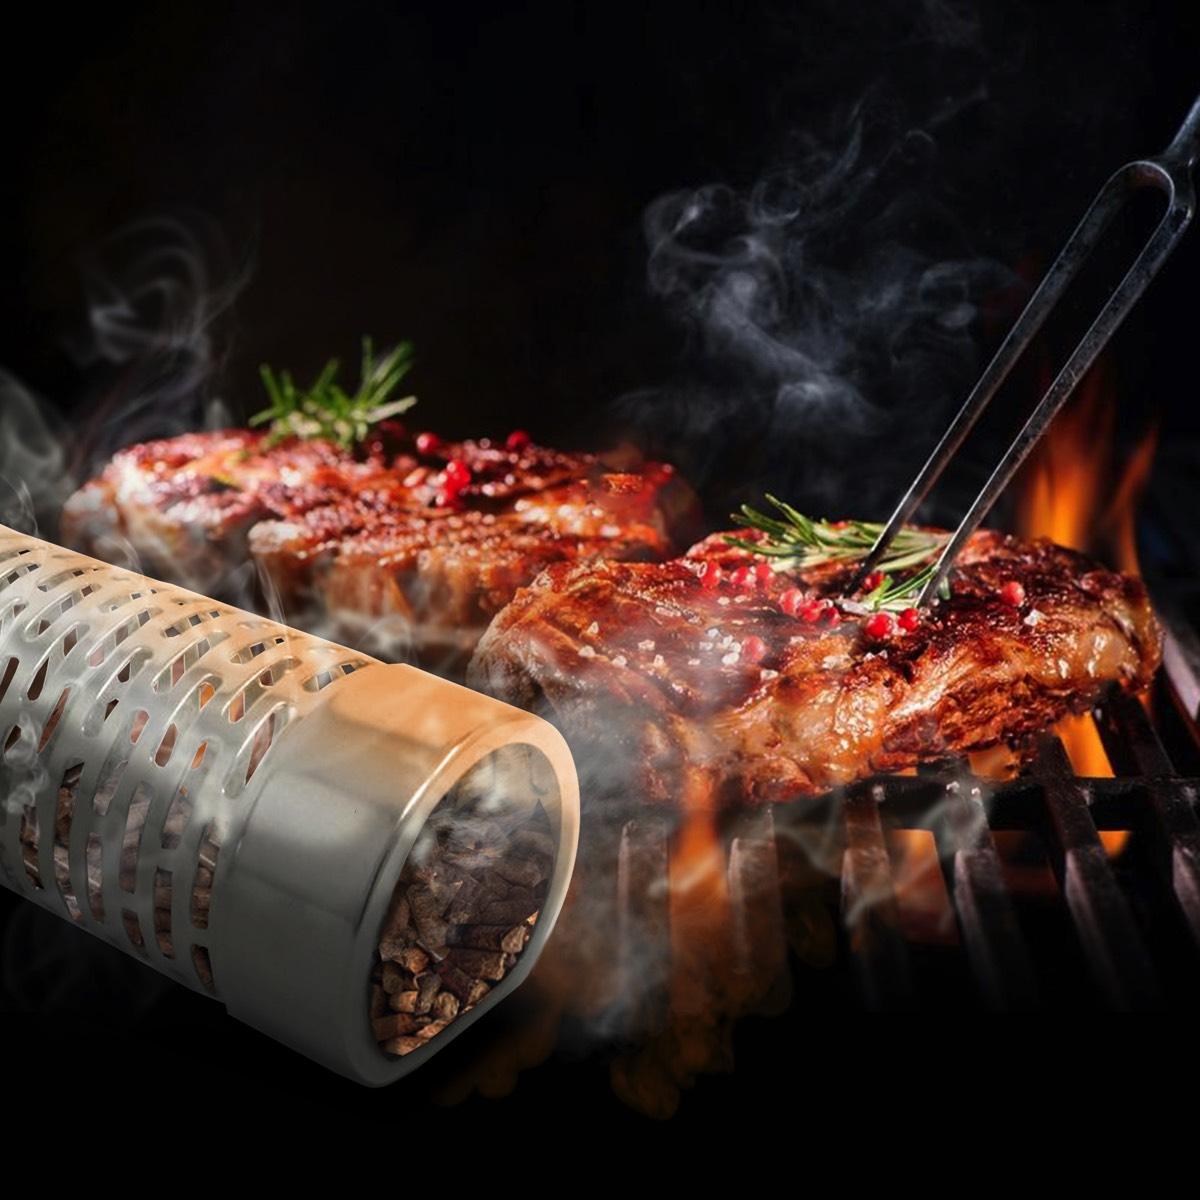 CHERRY Smoking wood chips, for food smokers /& smoke generators, NICE /& CLEAN :-